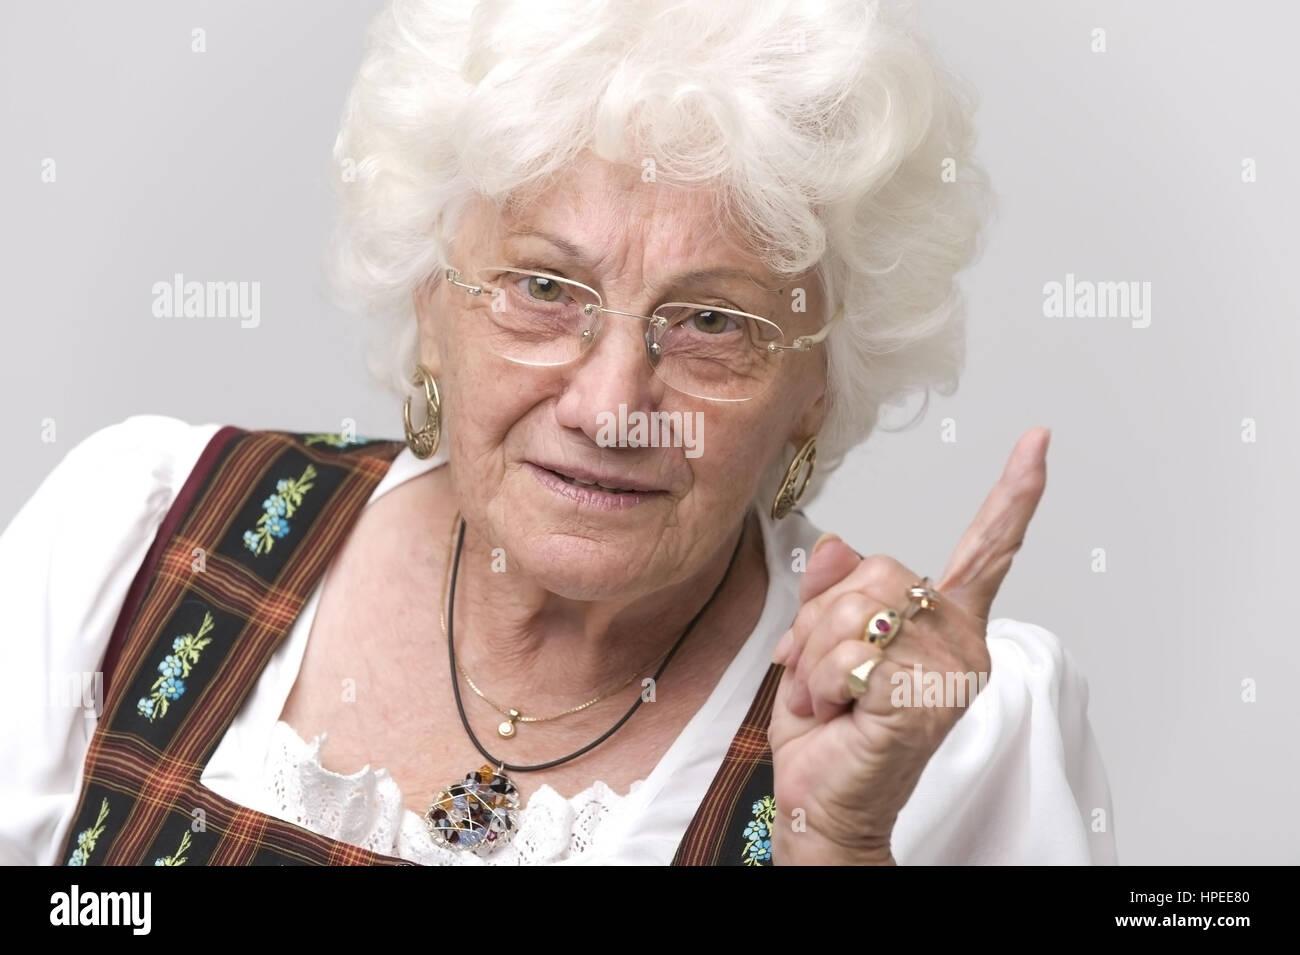 Model released , Seniorin mit erhobenem Zeigefinger - older woman with wagging forefinger Stock Photo